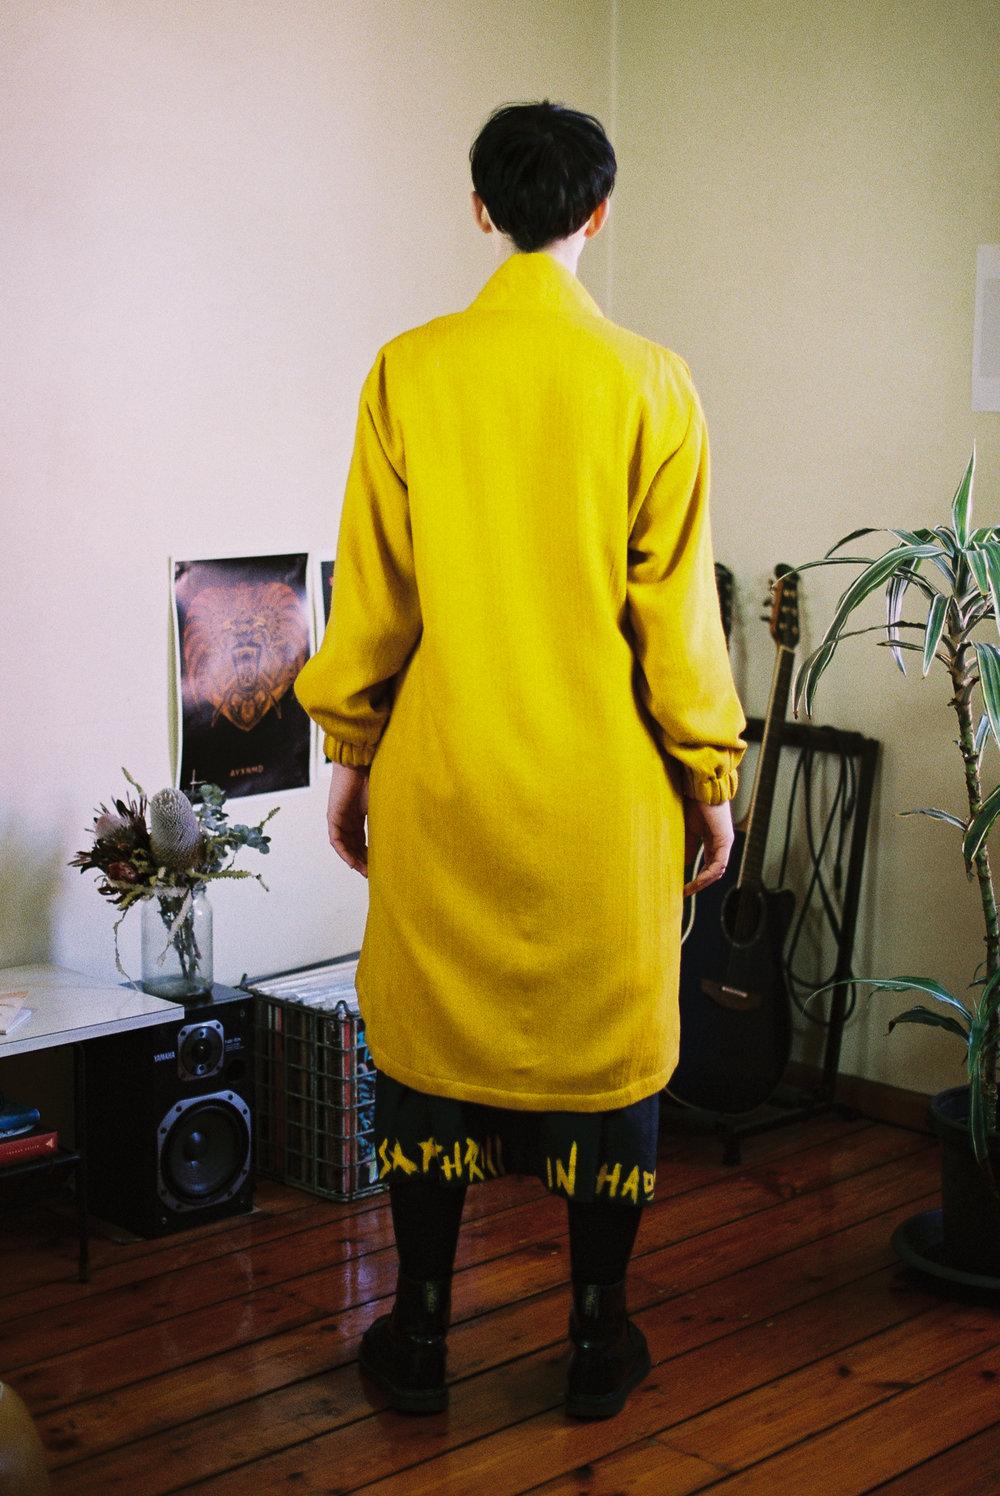 yellowjacket-6.jpg